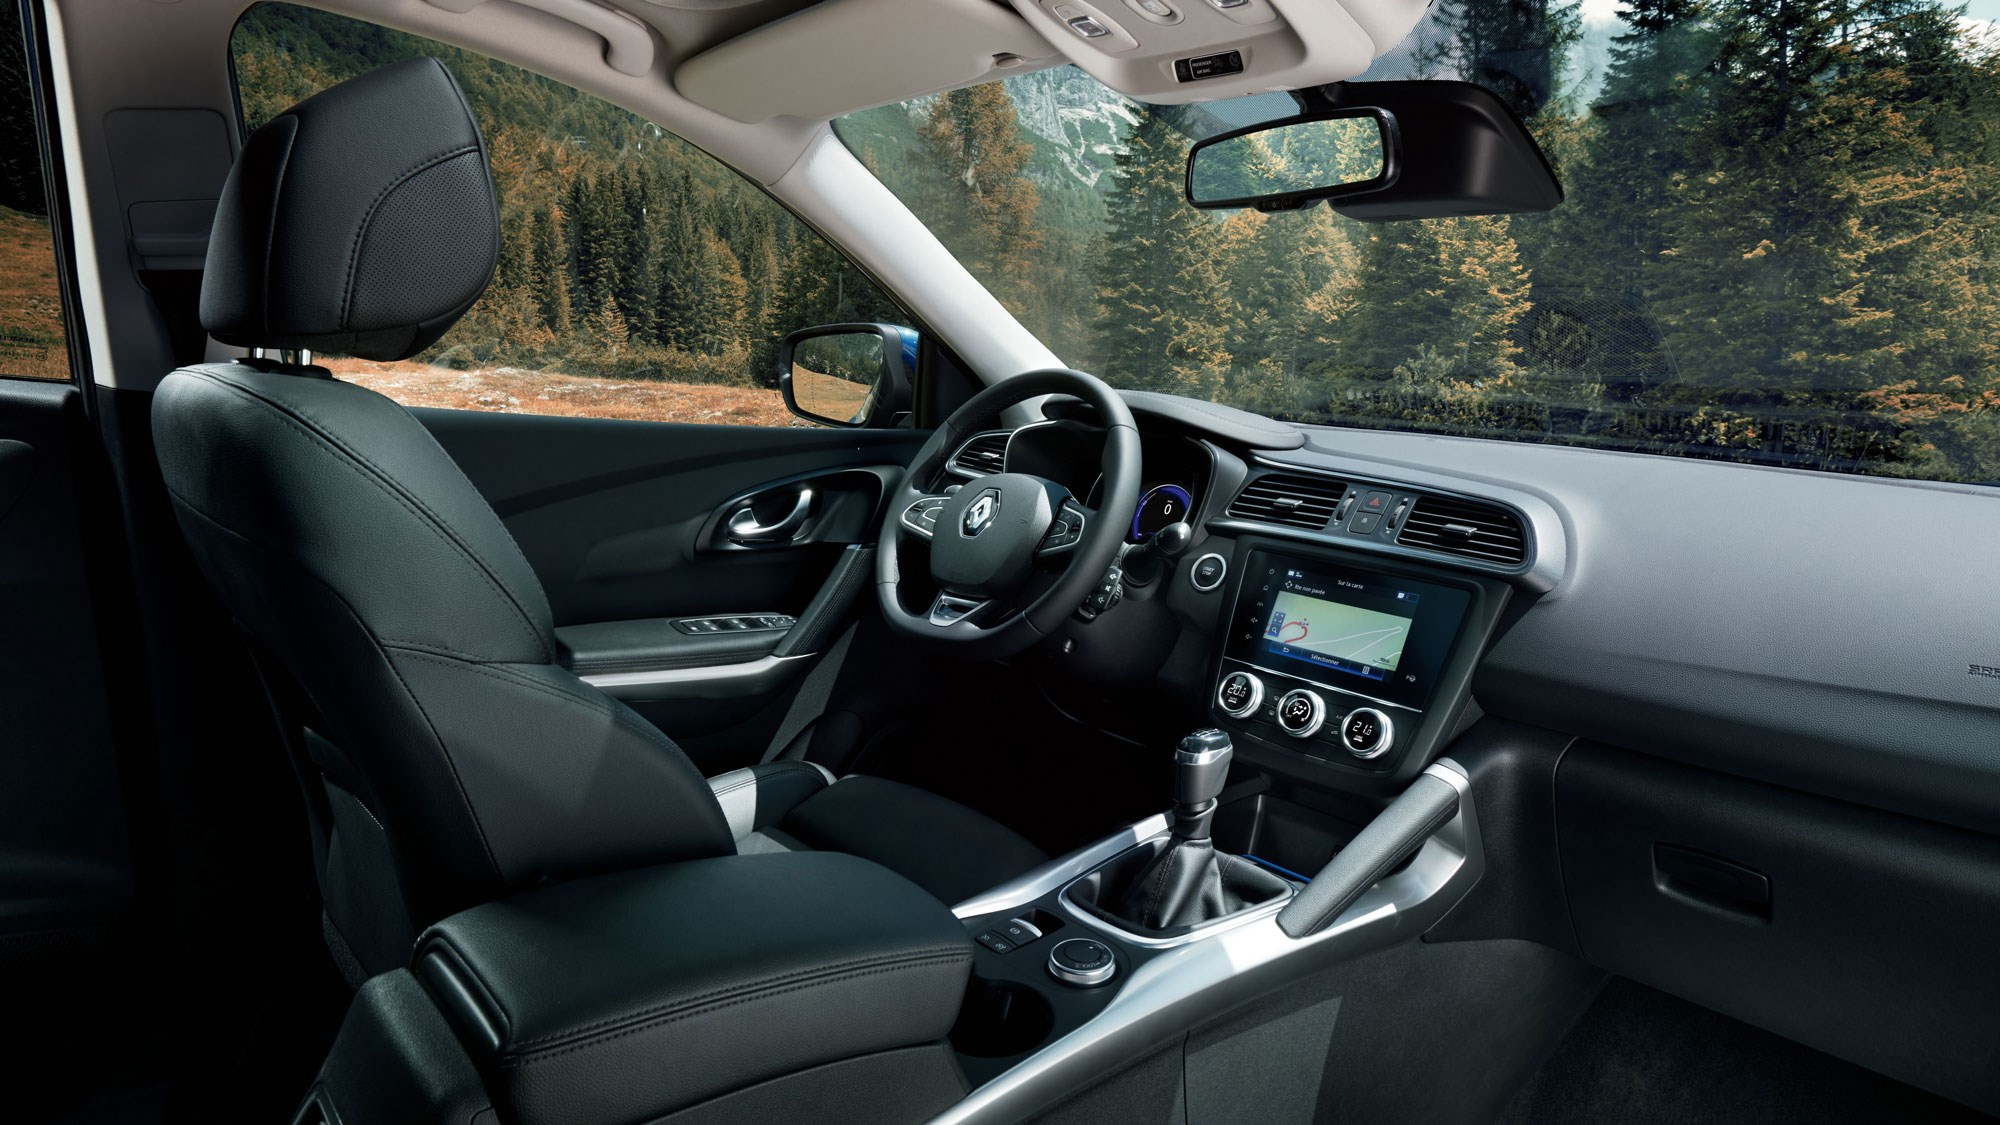 2020 Renault Kadjar Redesign, Interior >> New Renault Kadjar Facelifted Suv Revealed Ahead Of Paris